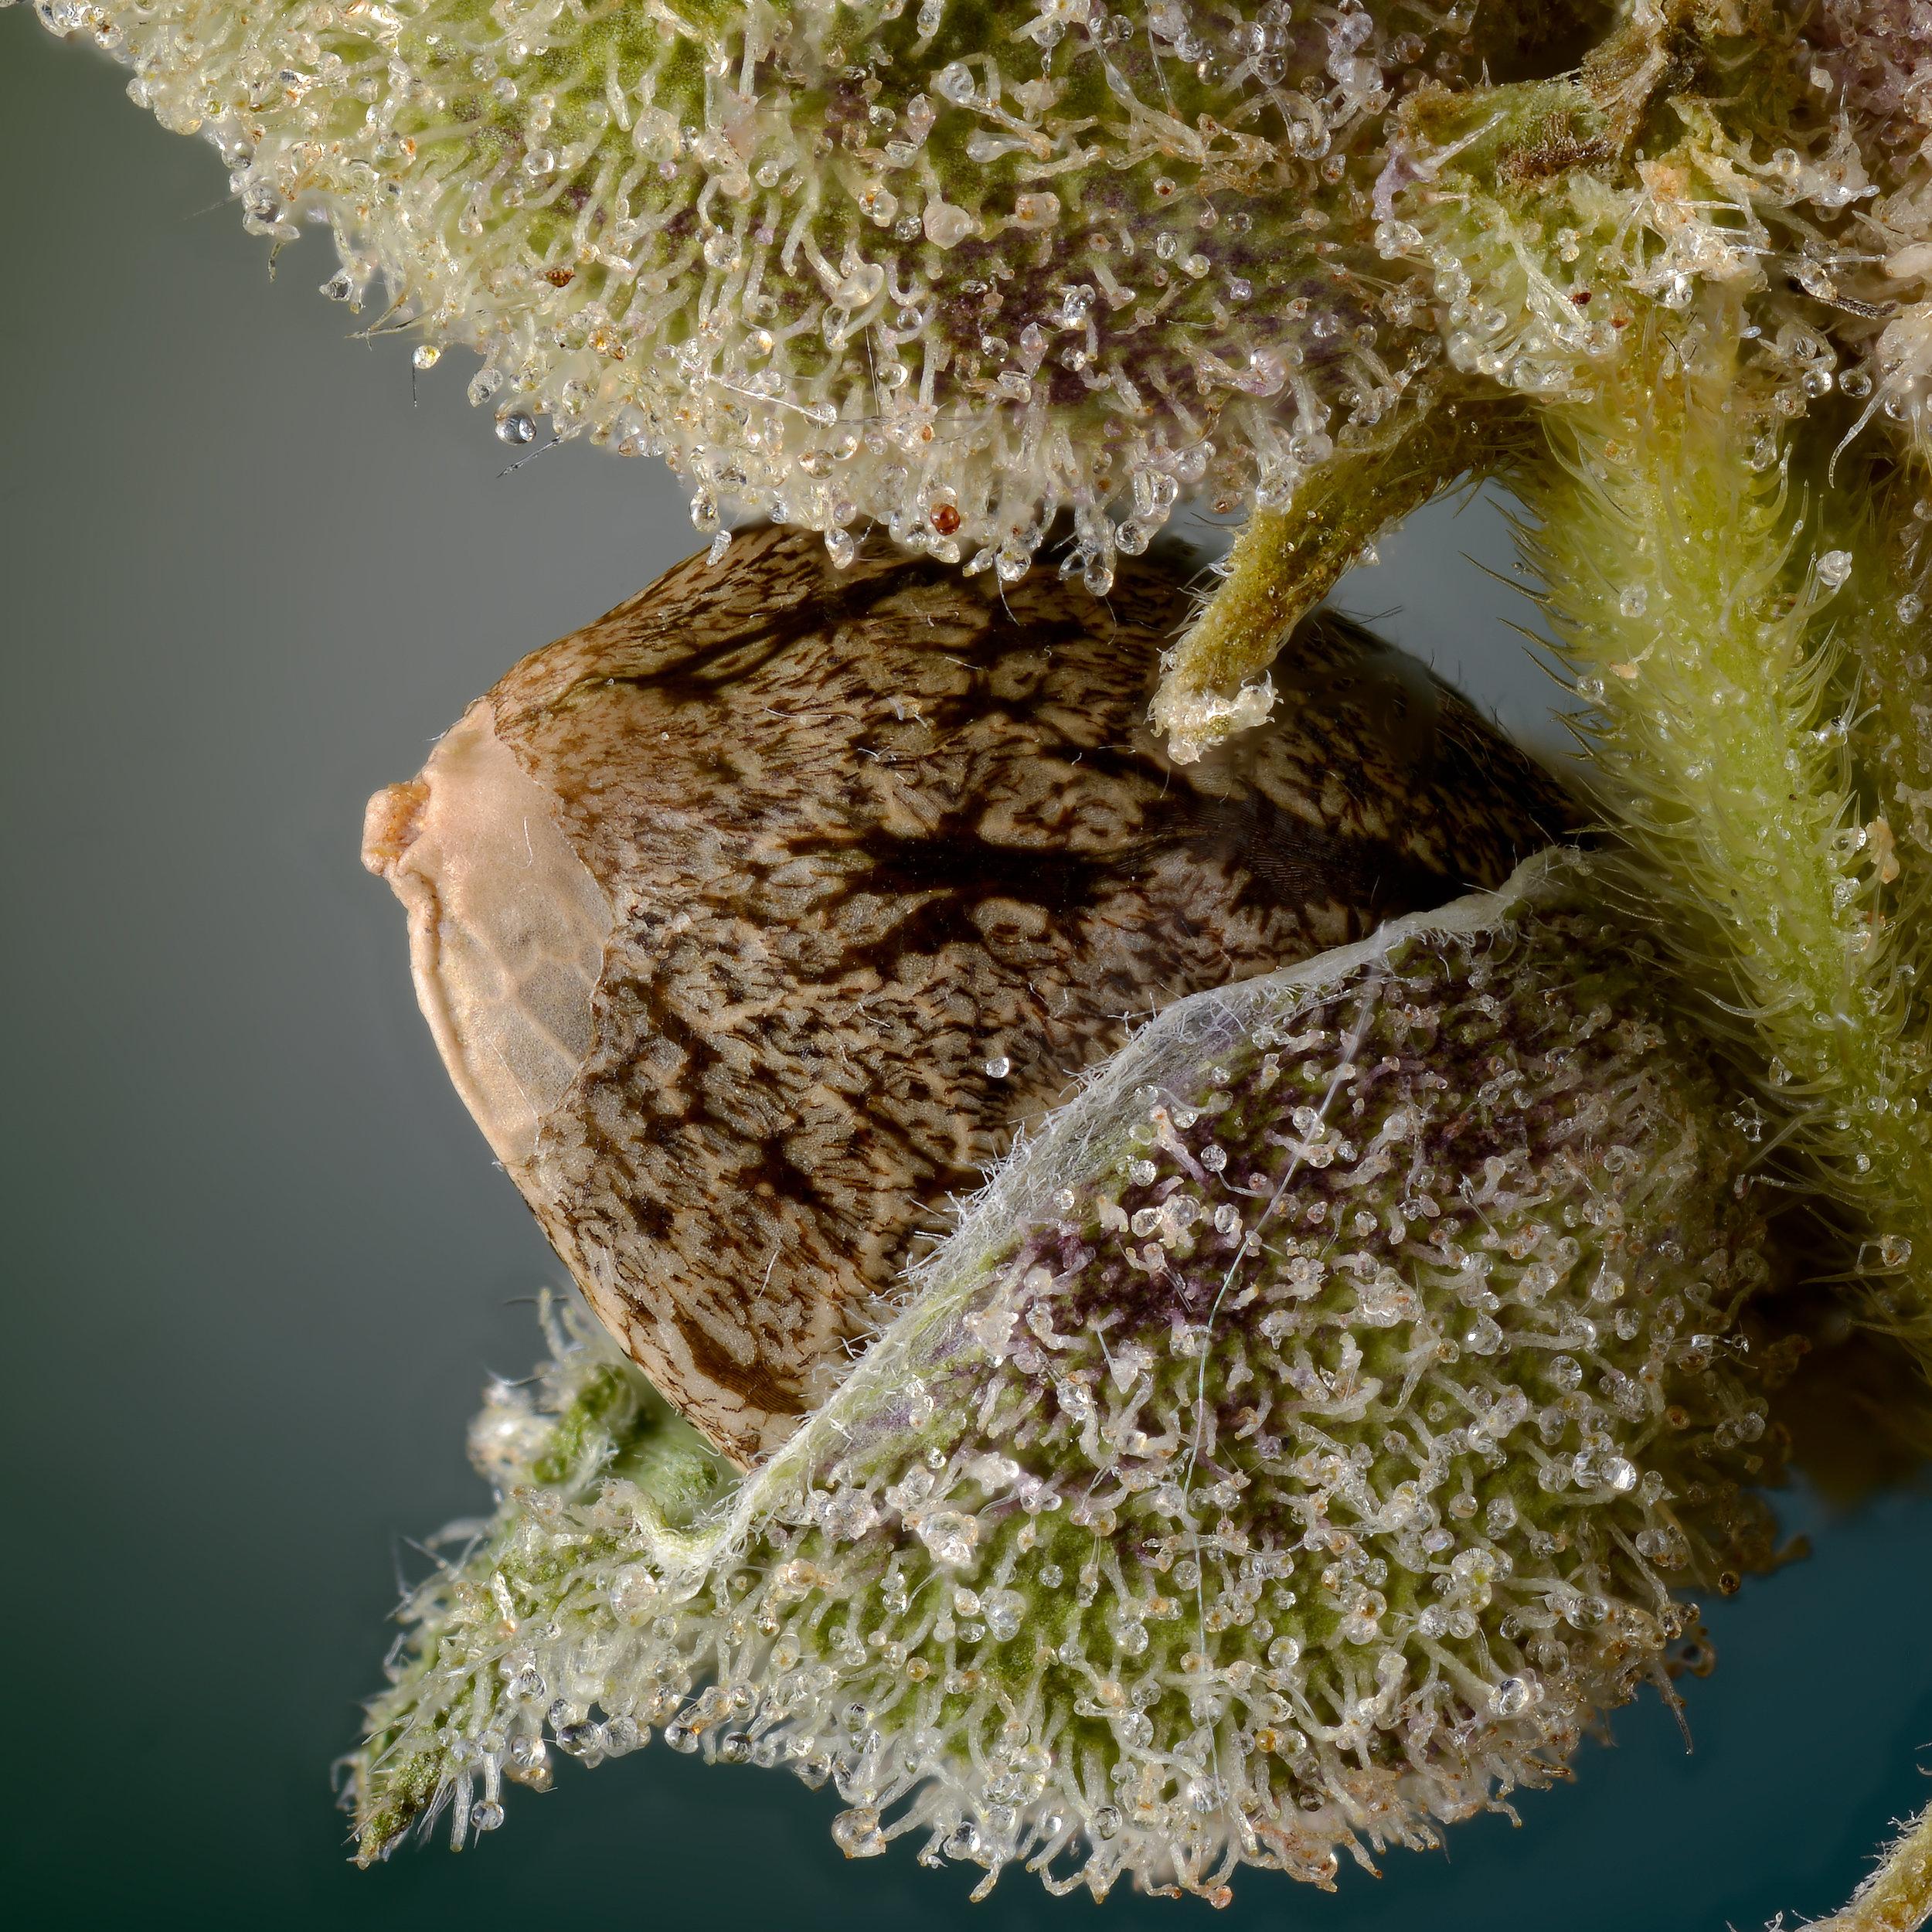 Selene seed